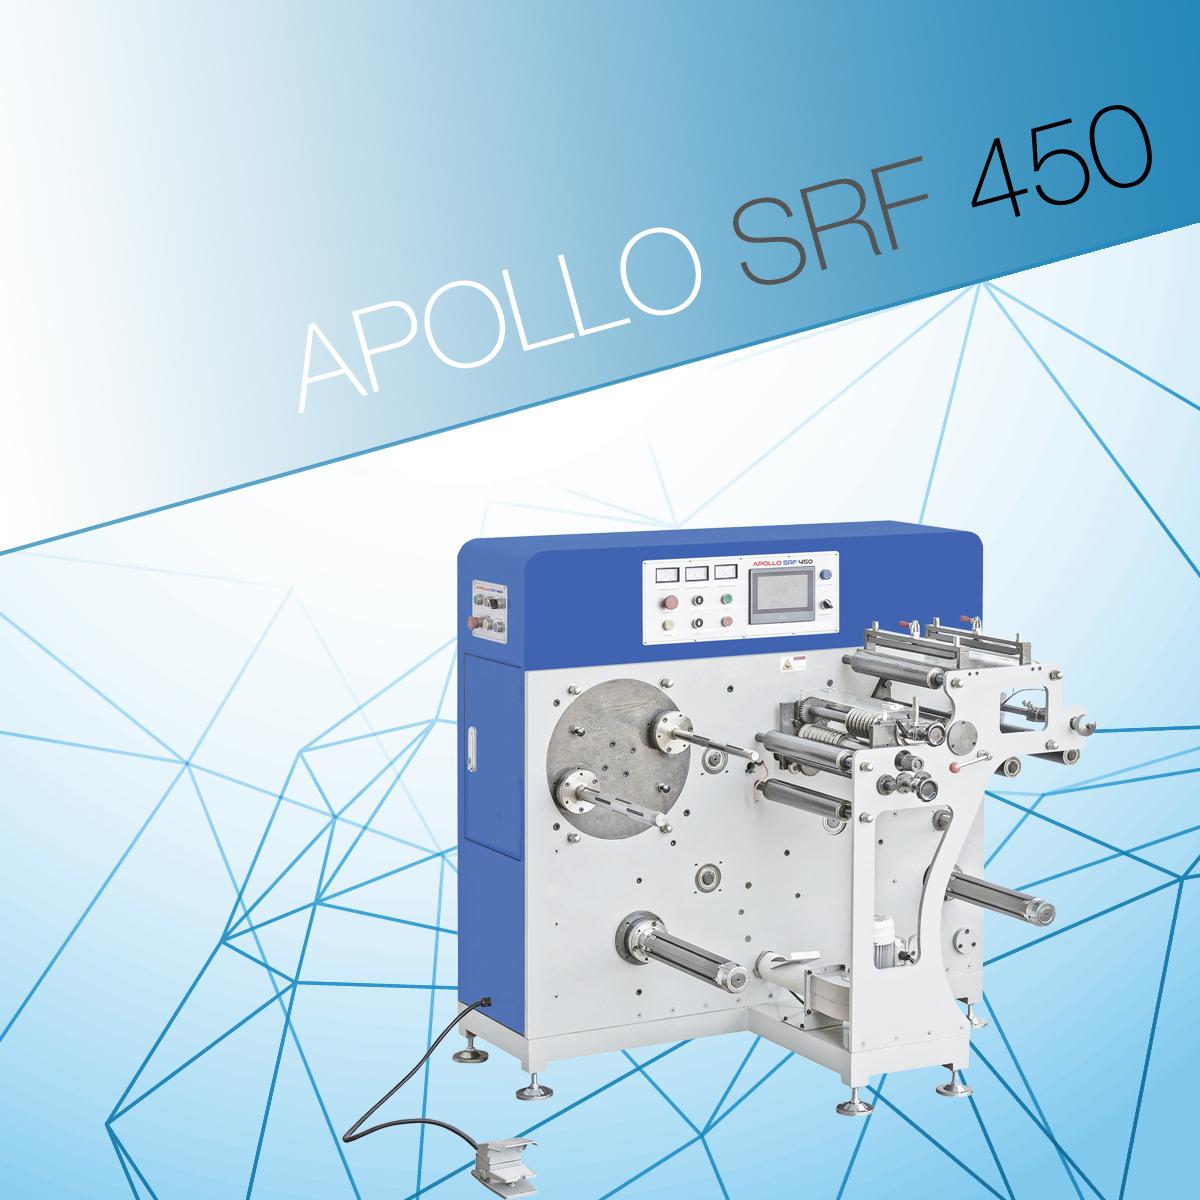 The Apollo SRF 450.jpg